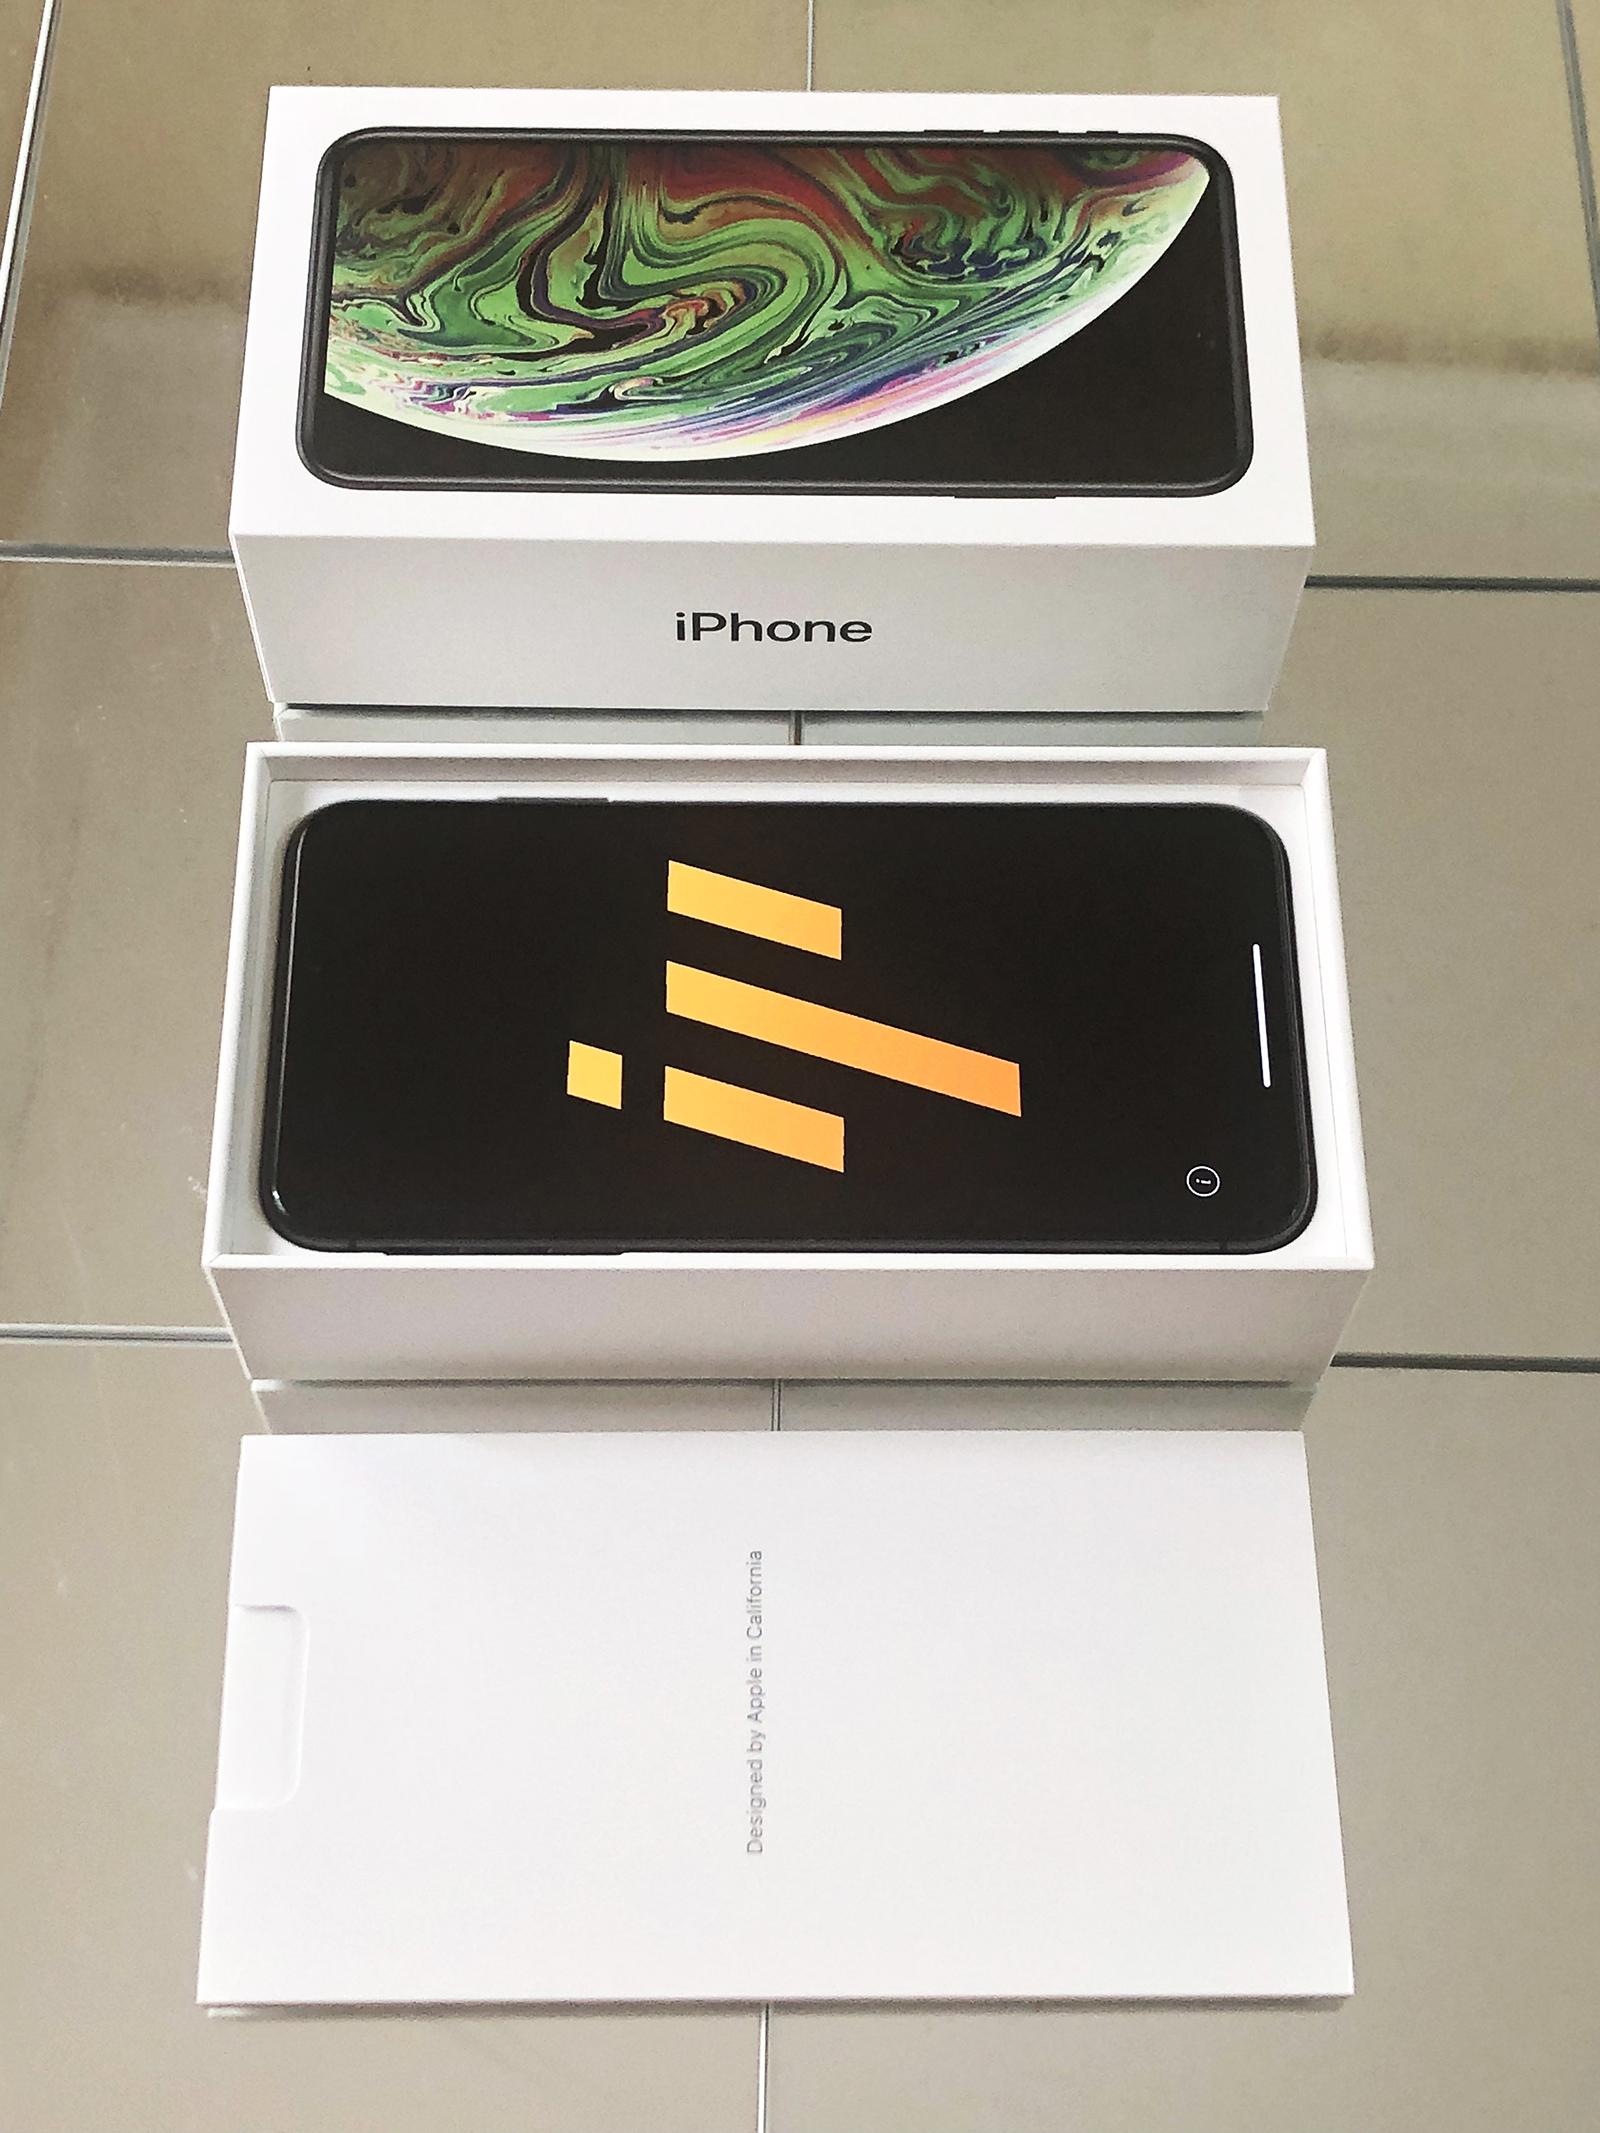 iPhone XS Max con el logo de iPhoneros